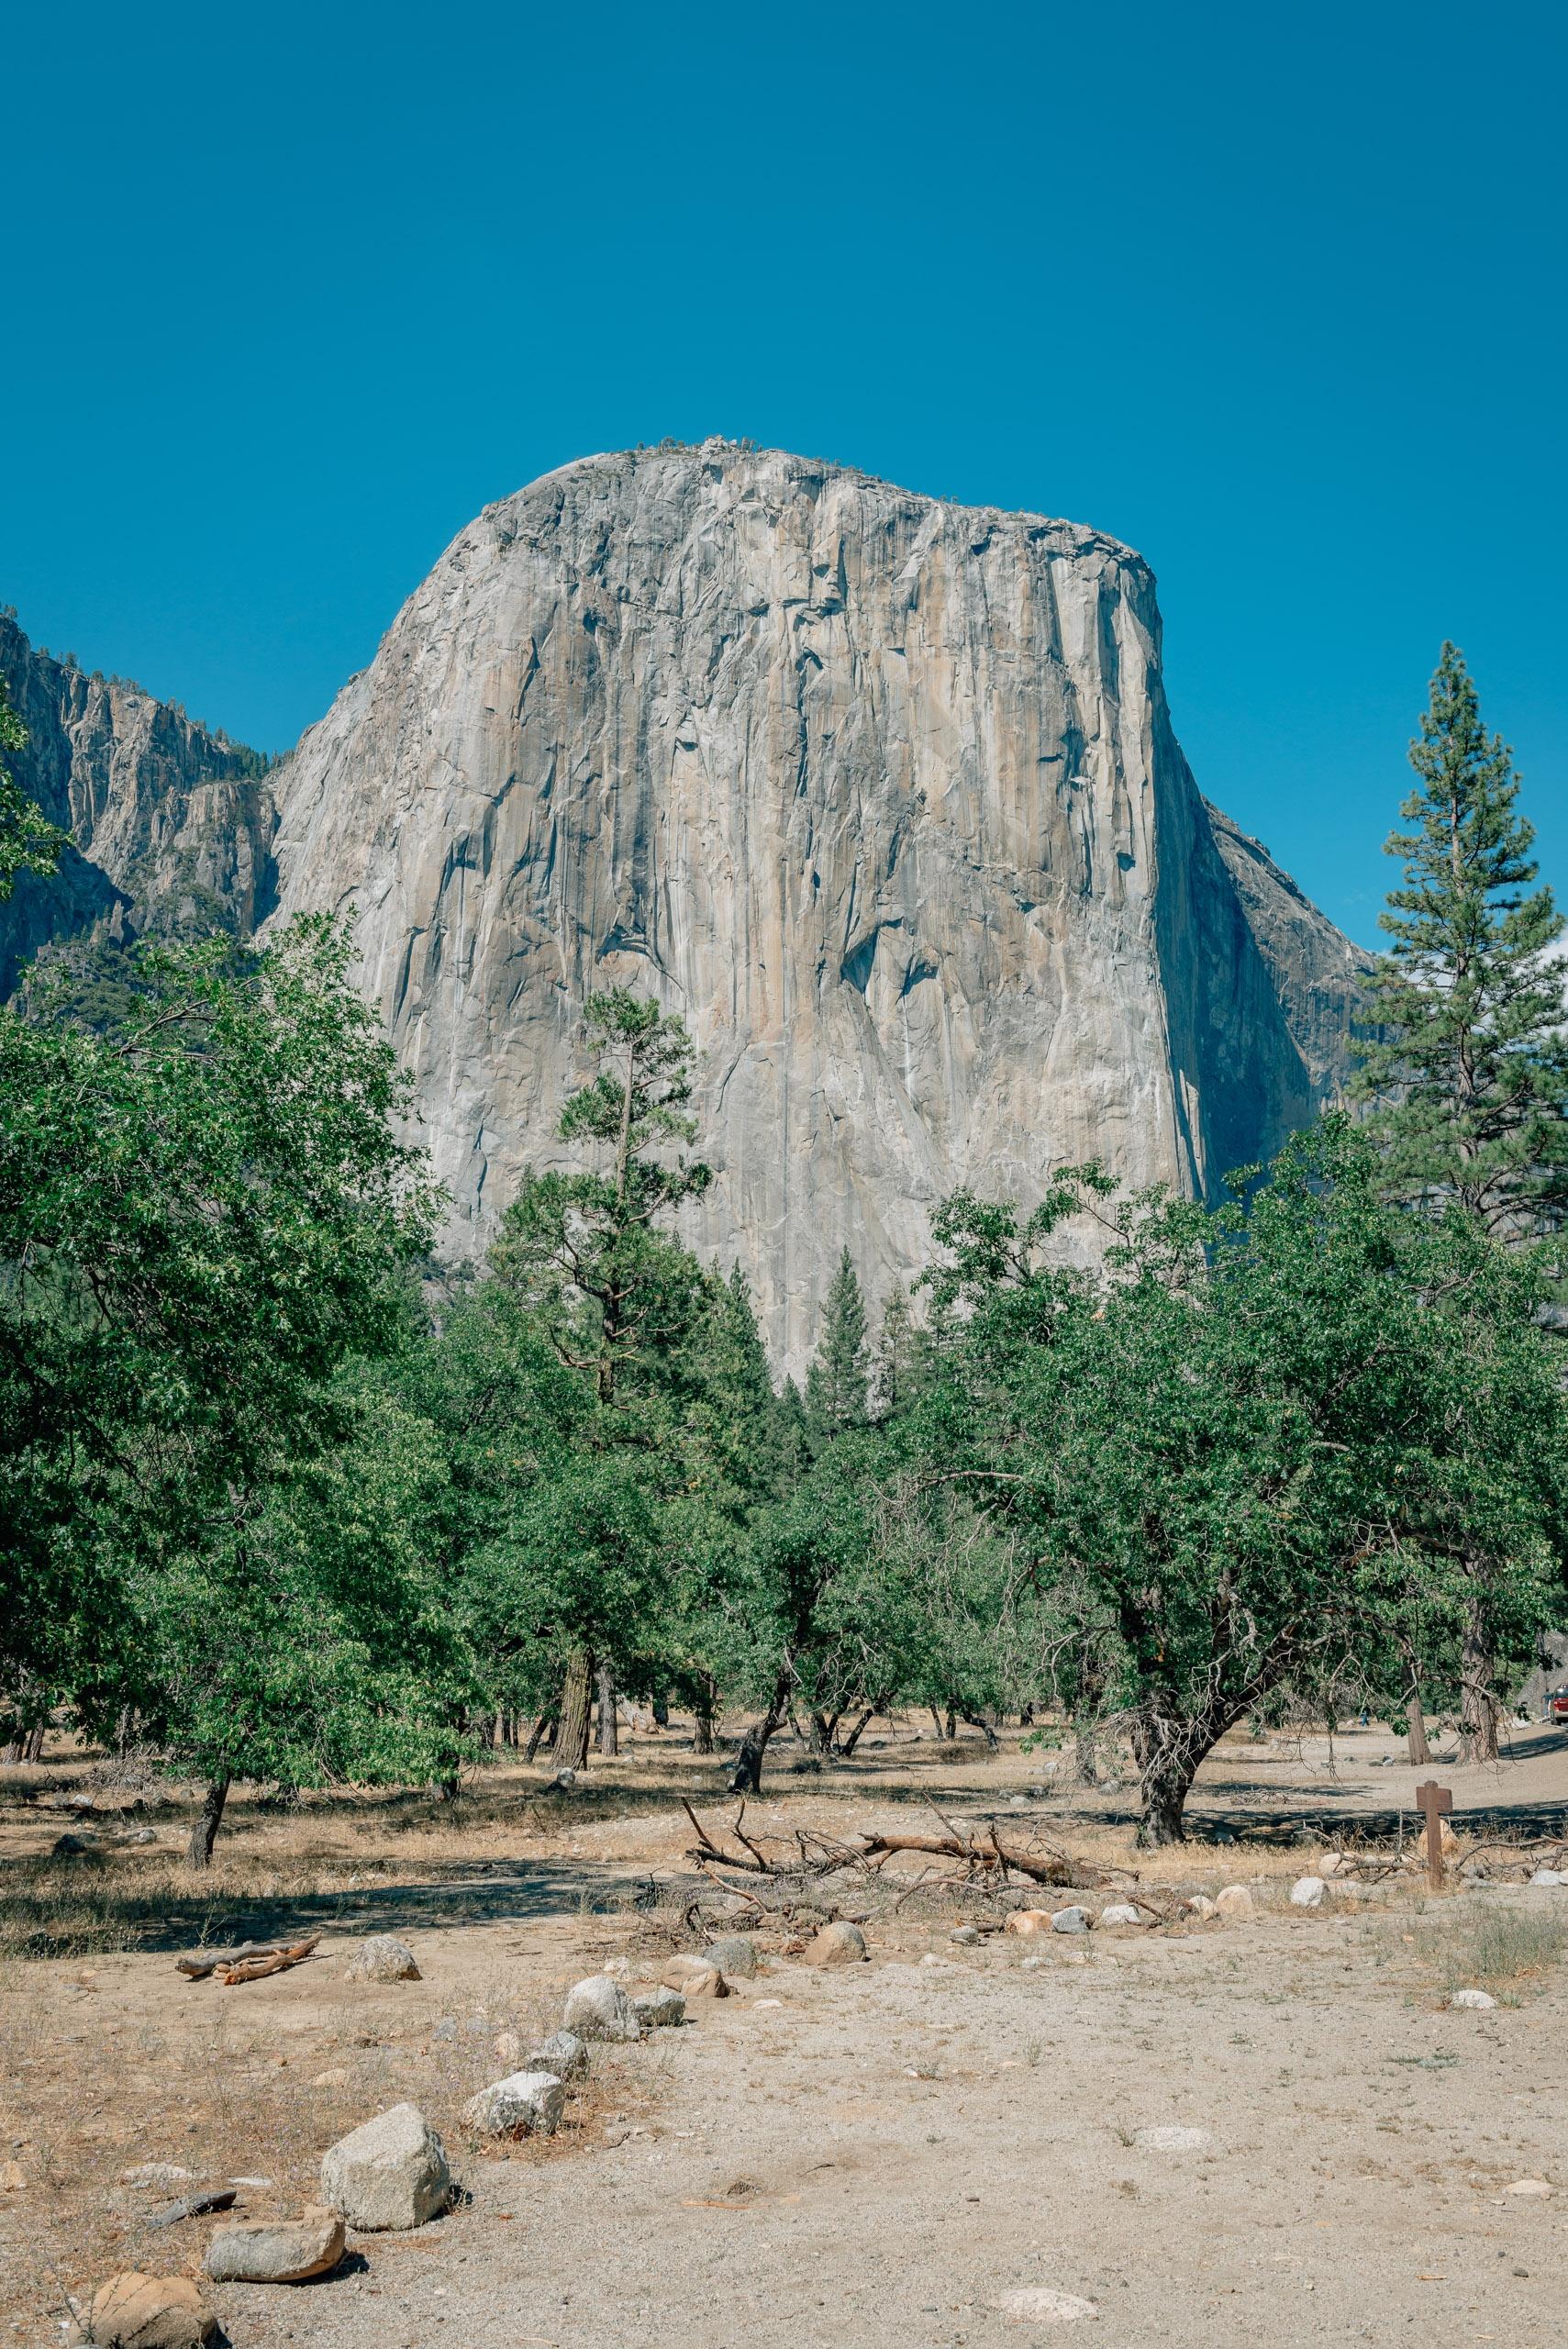 Yosemite National Park - 2012 - 2012-0721-DSC_0213_70050